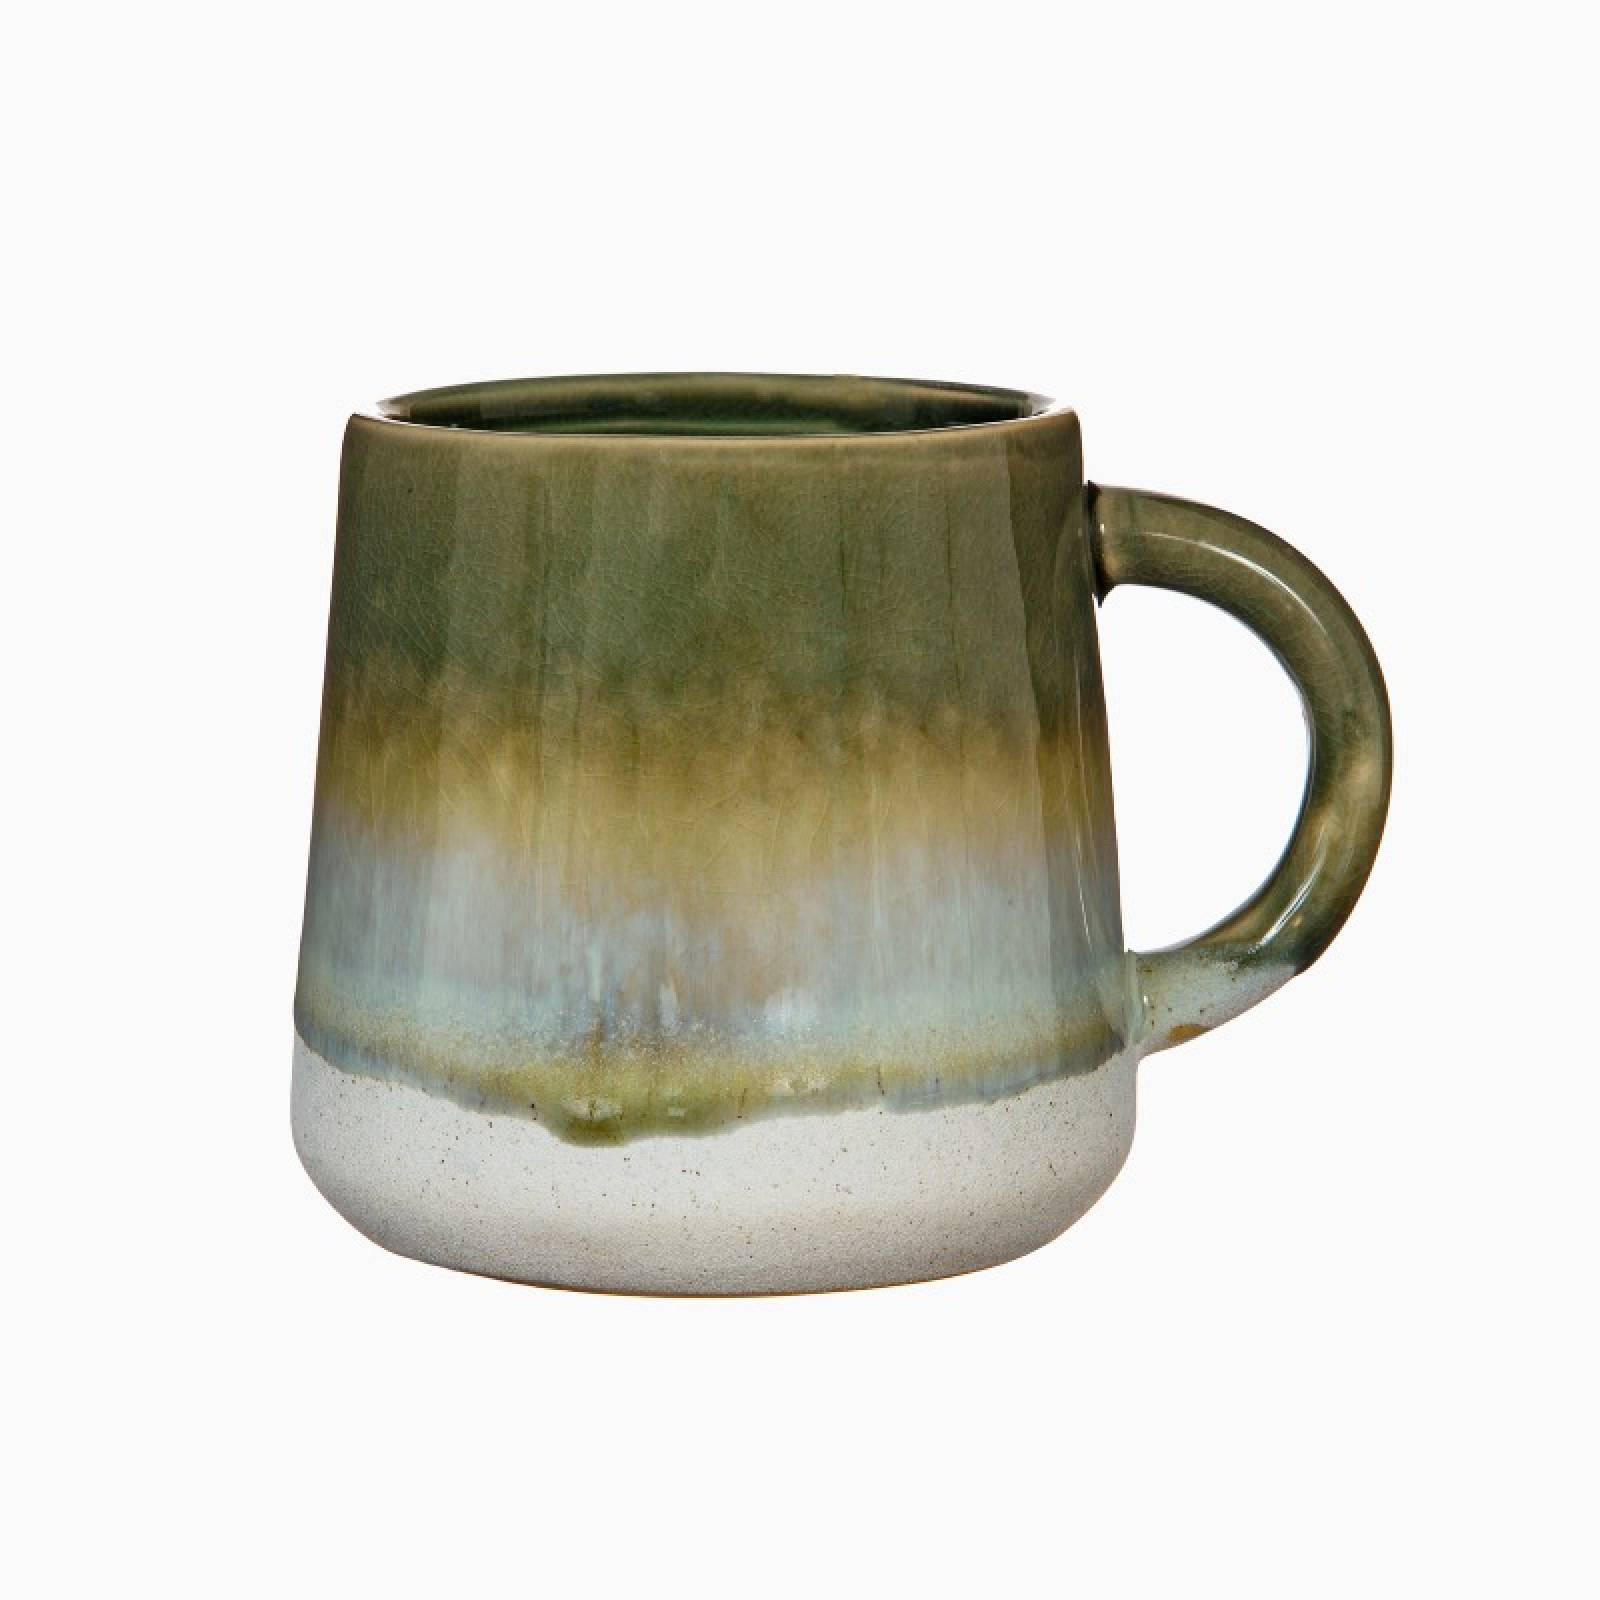 Two Tone Dip Glazed Stoneware Mug In Green